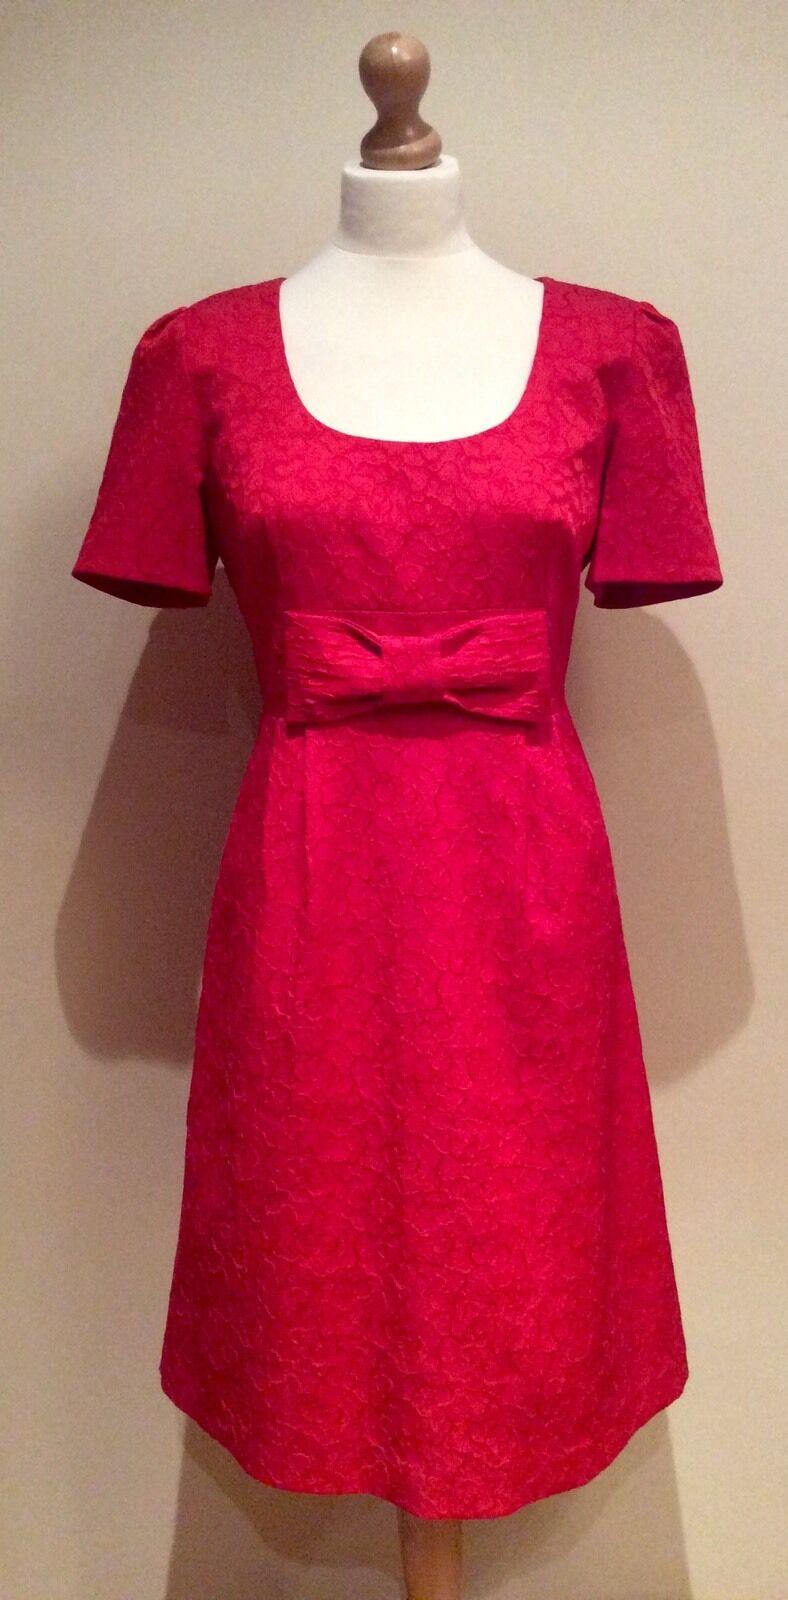 PHASE EIGHT rot BOW DRESS Größe 14 COTTON MIX